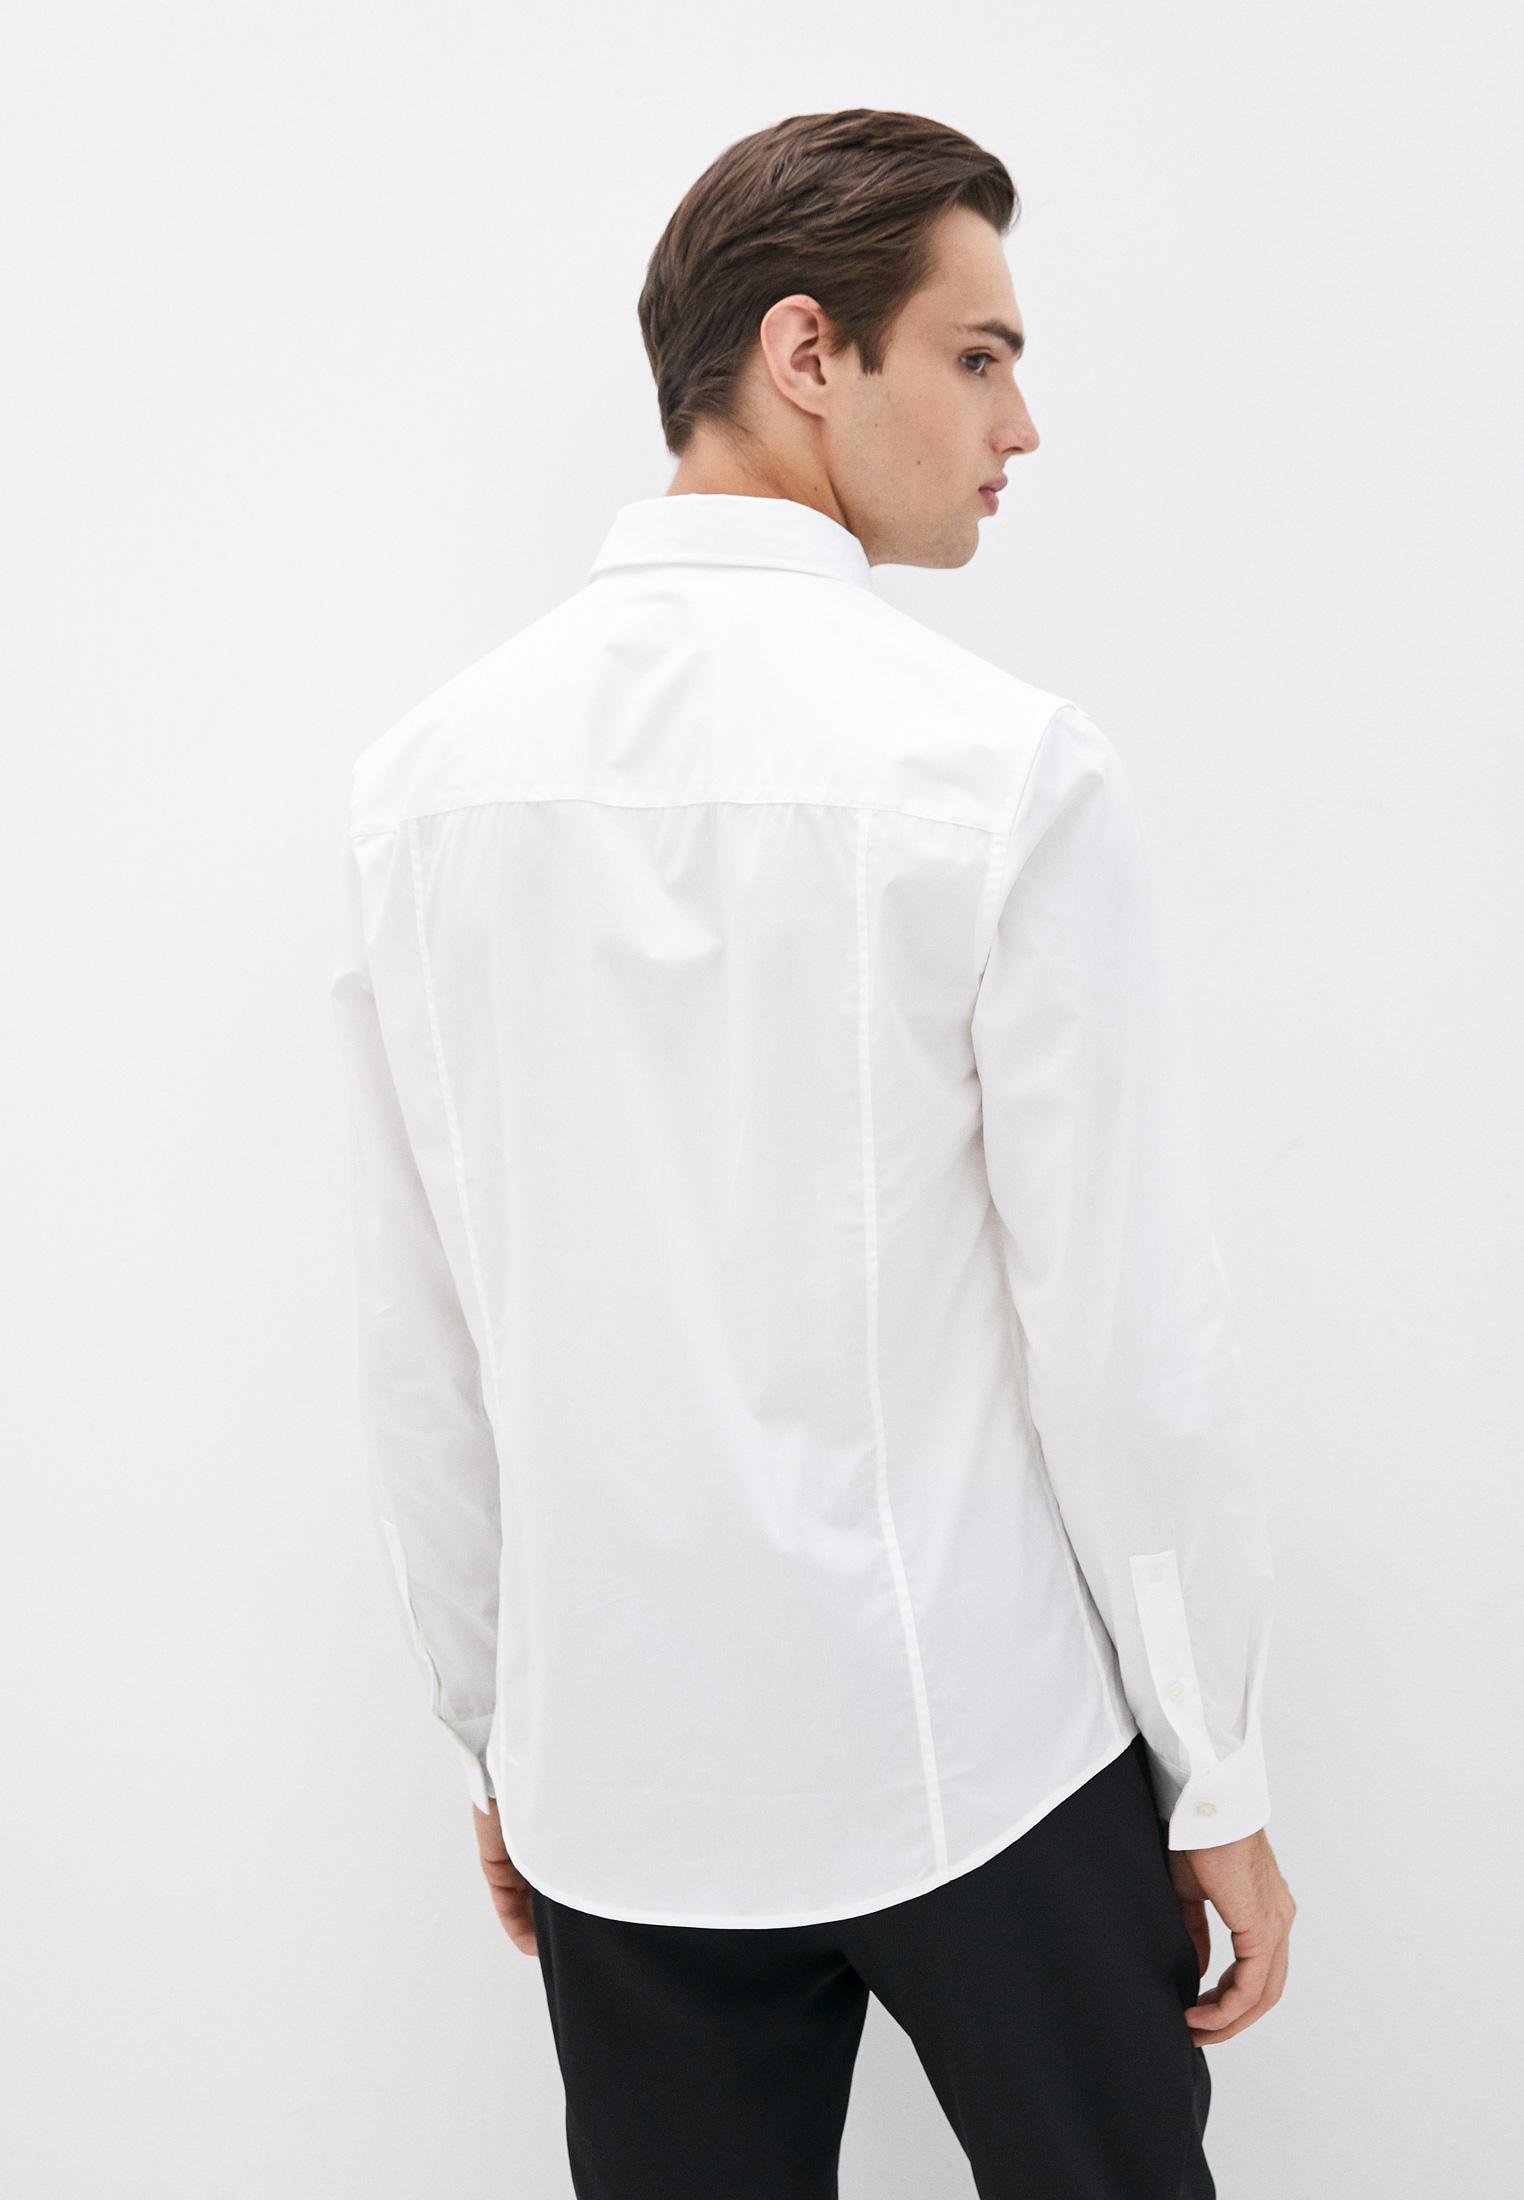 Рубашка с длинным рукавом Bikkembergs (Биккембергс) C C 009 2C S 2931: изображение 4